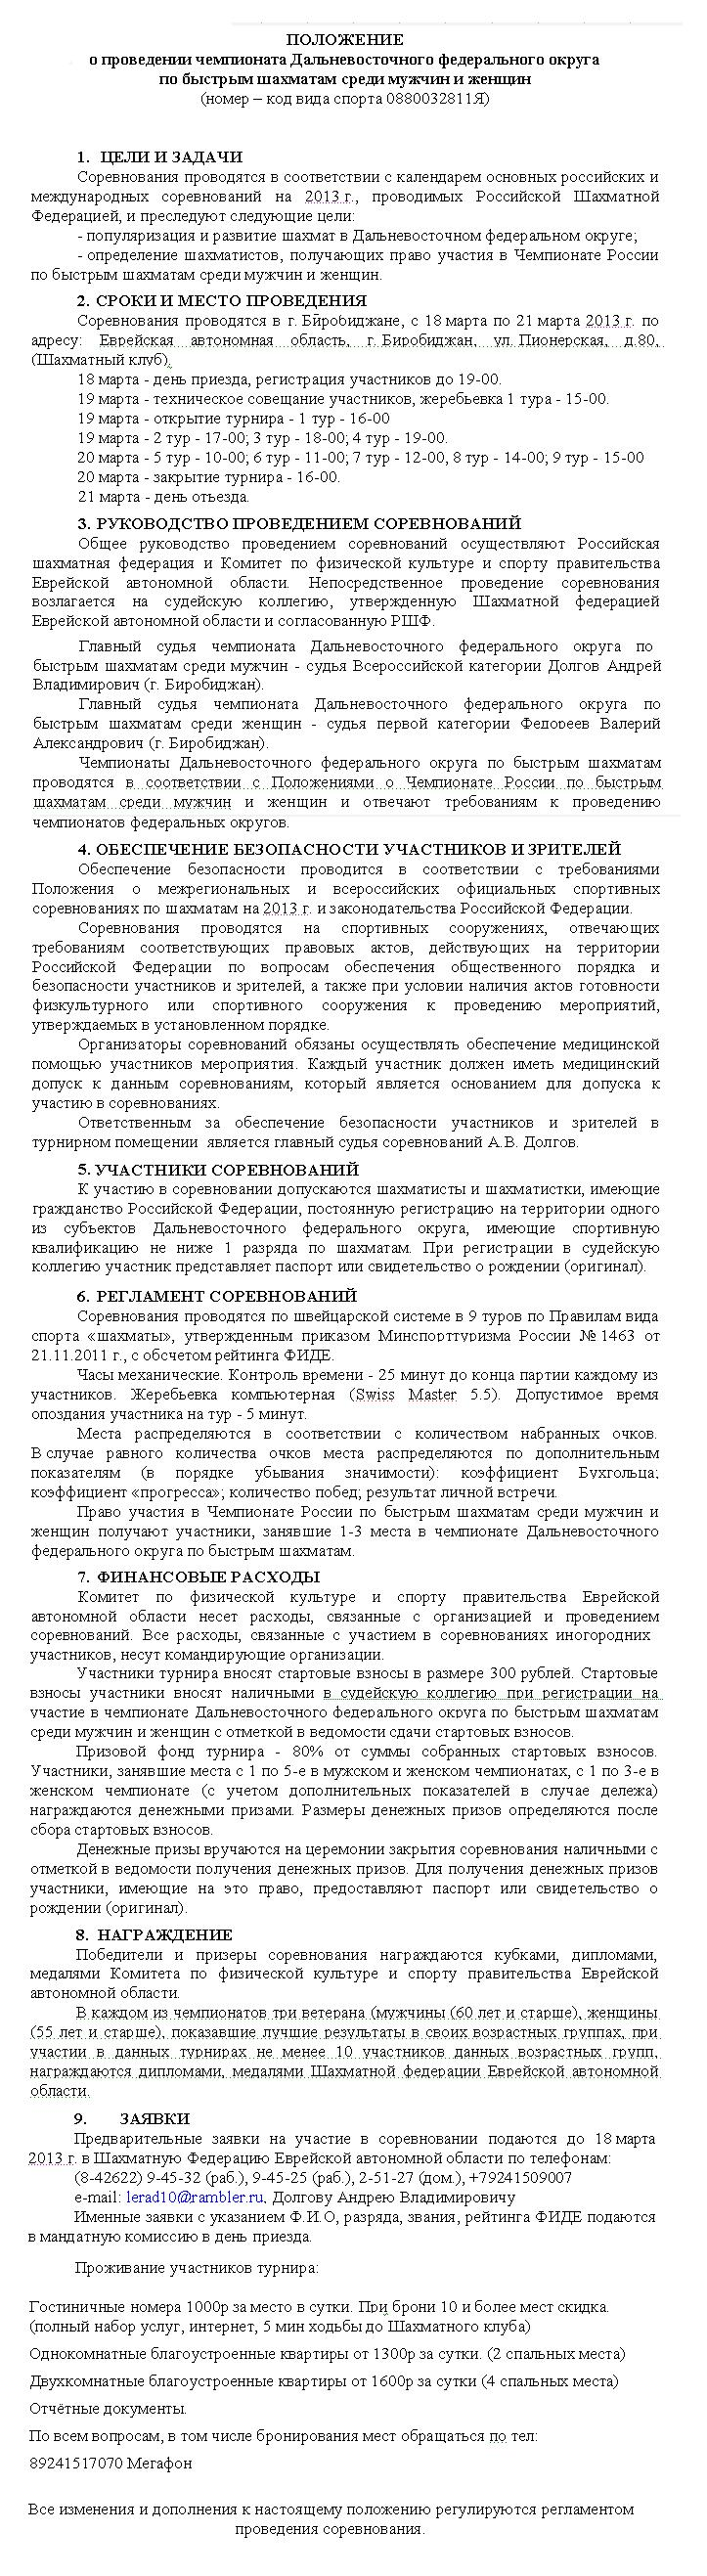 http://s2.uploads.ru/IZ57s.jpg